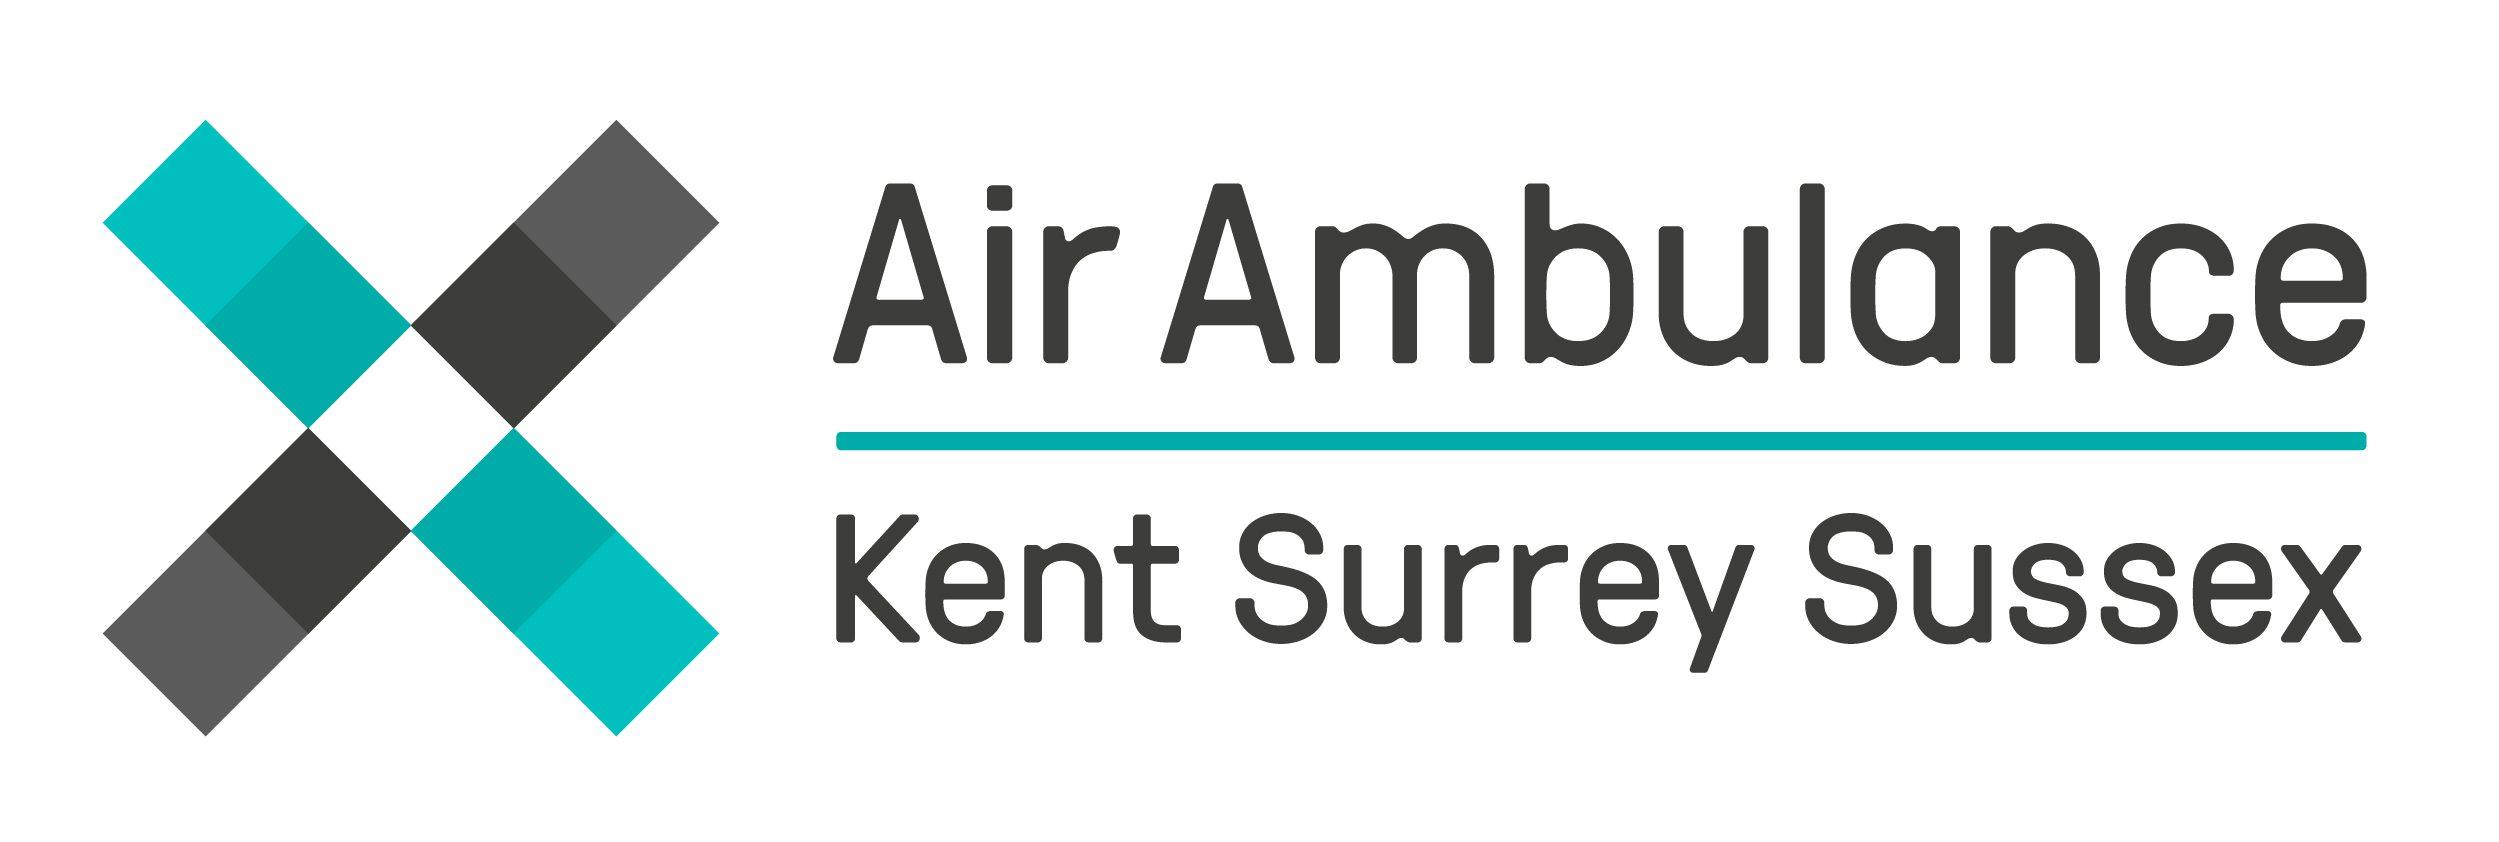 Air Ambulance KSS